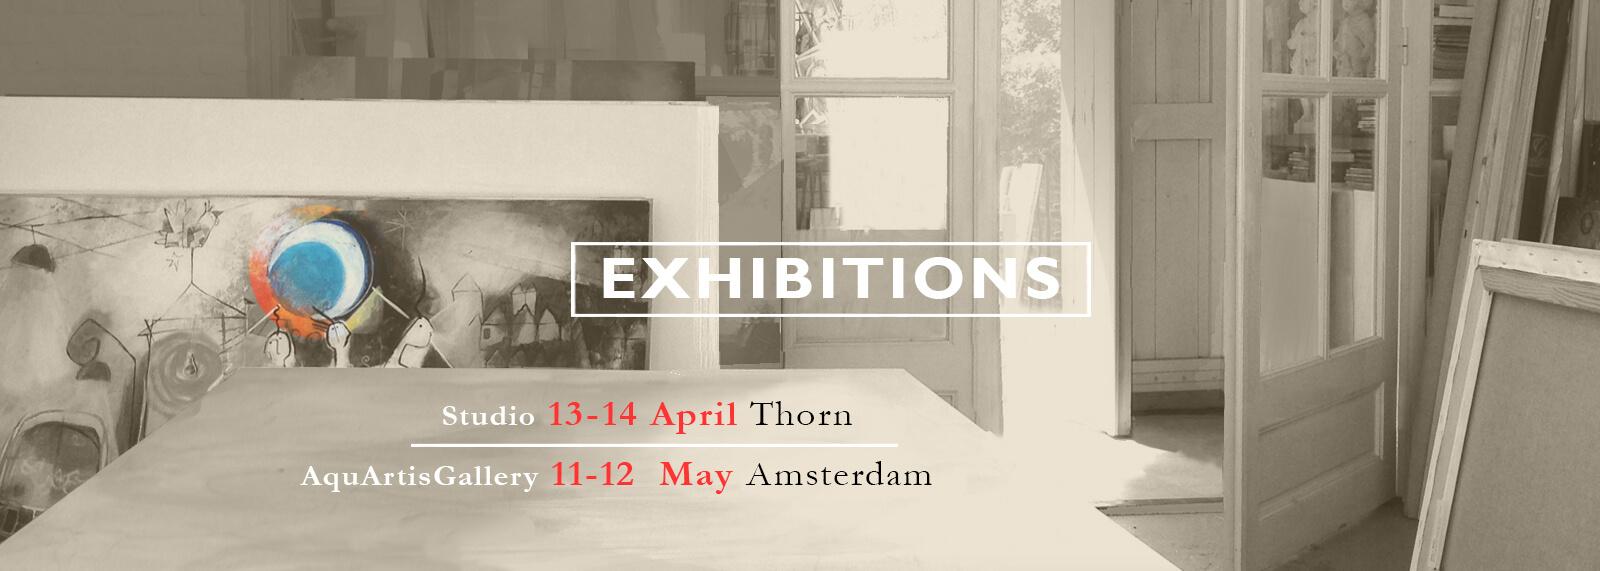 Exhibitions by Angeles Nieto